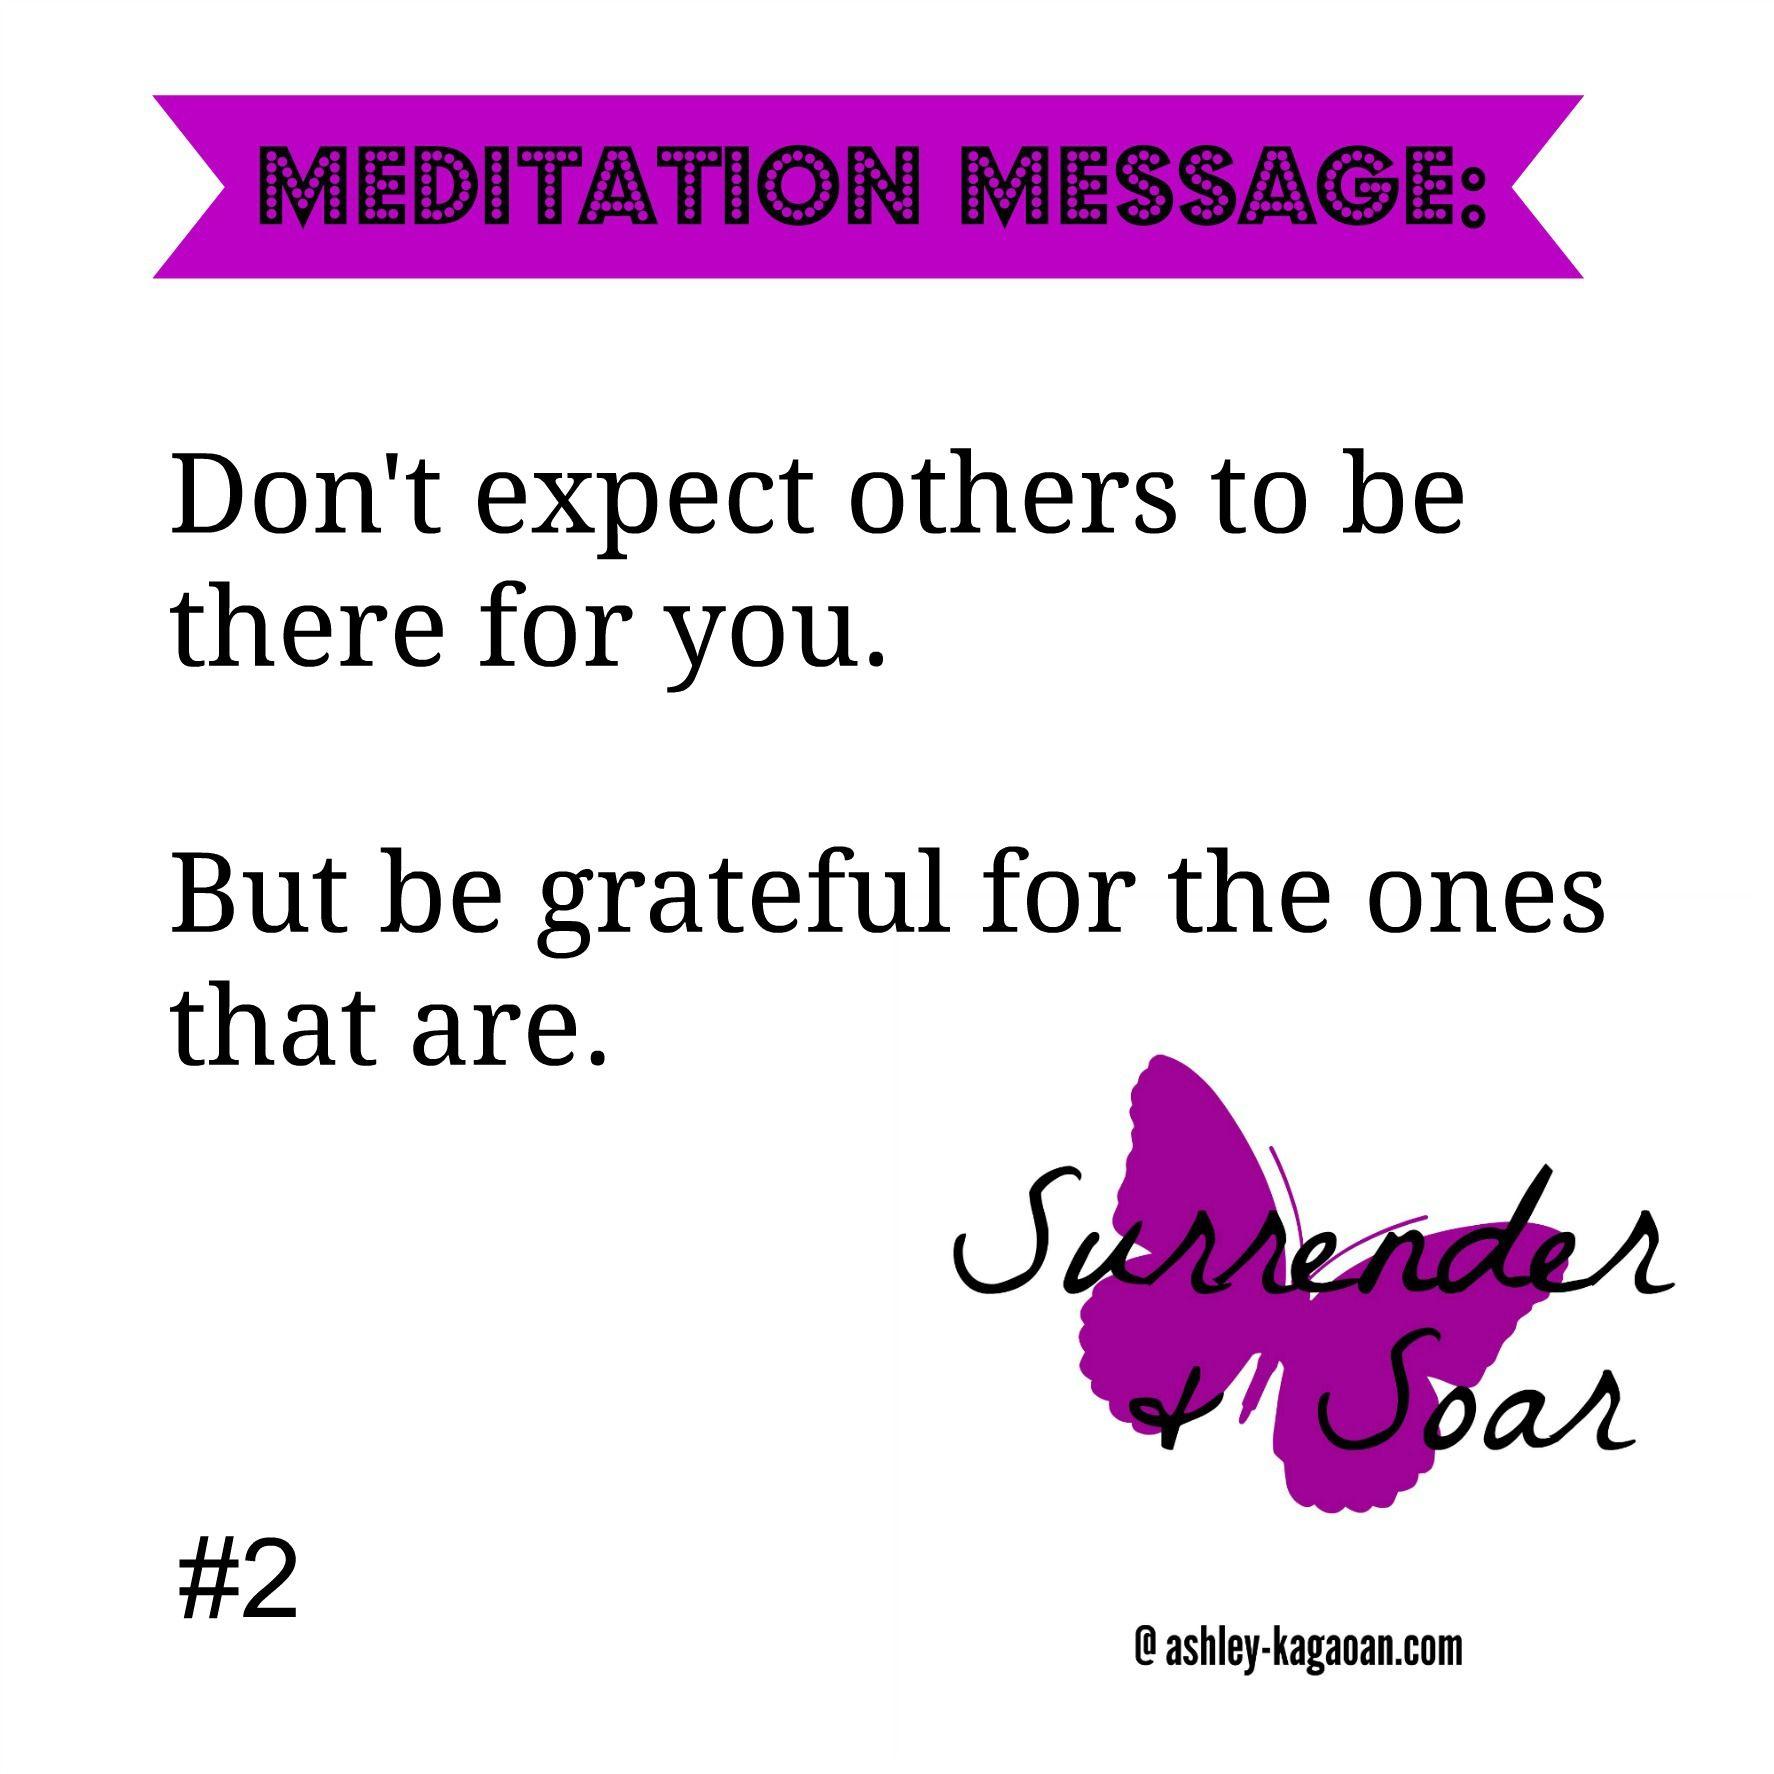 Meditation Message #2 #affirmations #positivemessages #inspiration #spiritual